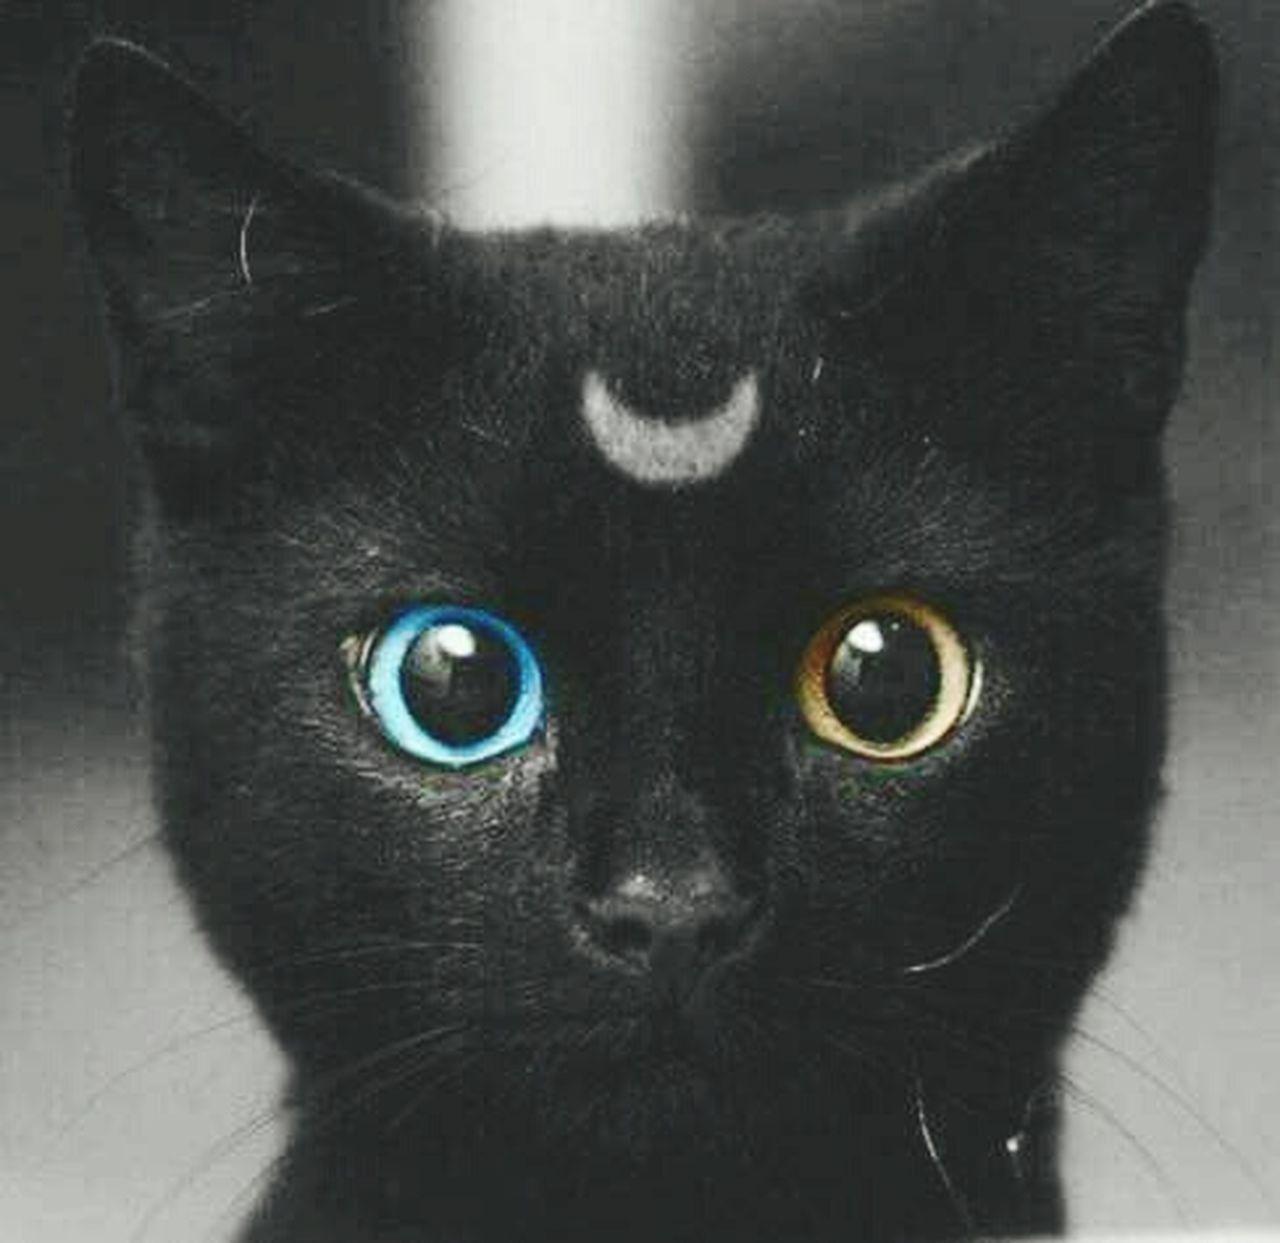 looking at camera, portrait, eye, domestic cat, pets, one animal, animal head, animal themes, domestic animals, black color, close-up, yellow eyes, human eye, mammal, iris - eye, indoors, eyeball, day, people